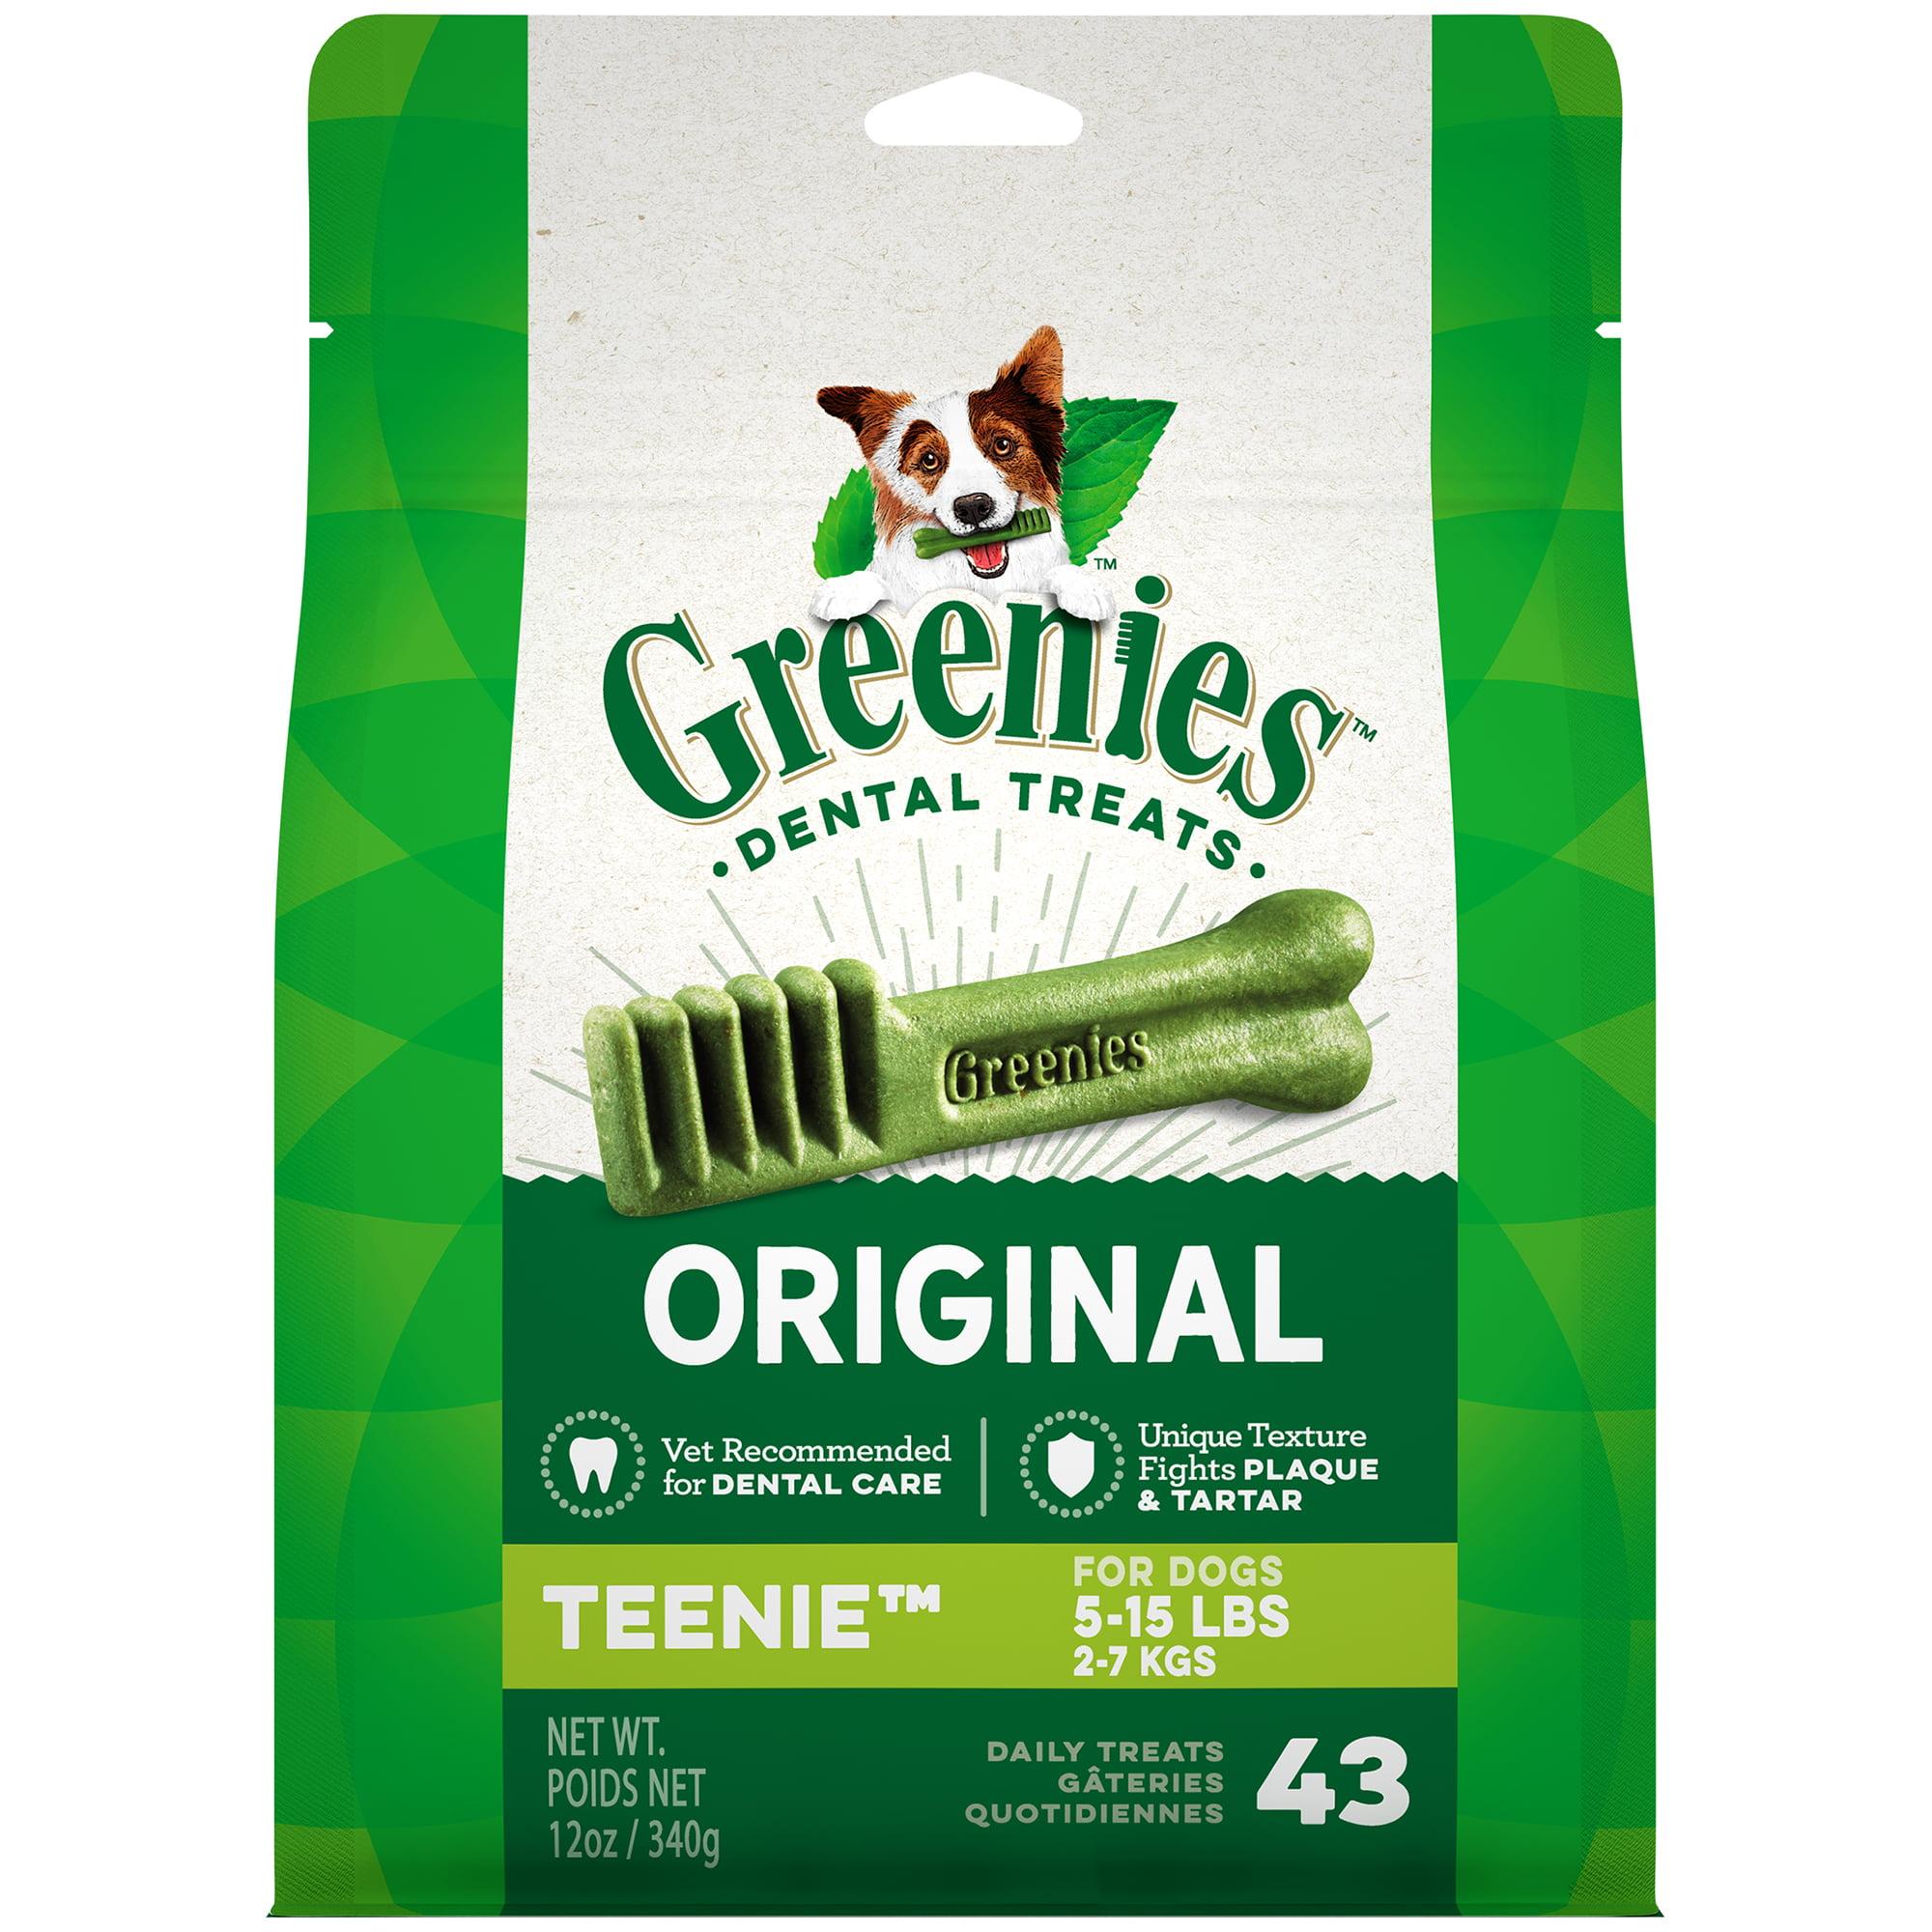 ADMC 12oz Teenie Greenies 04131